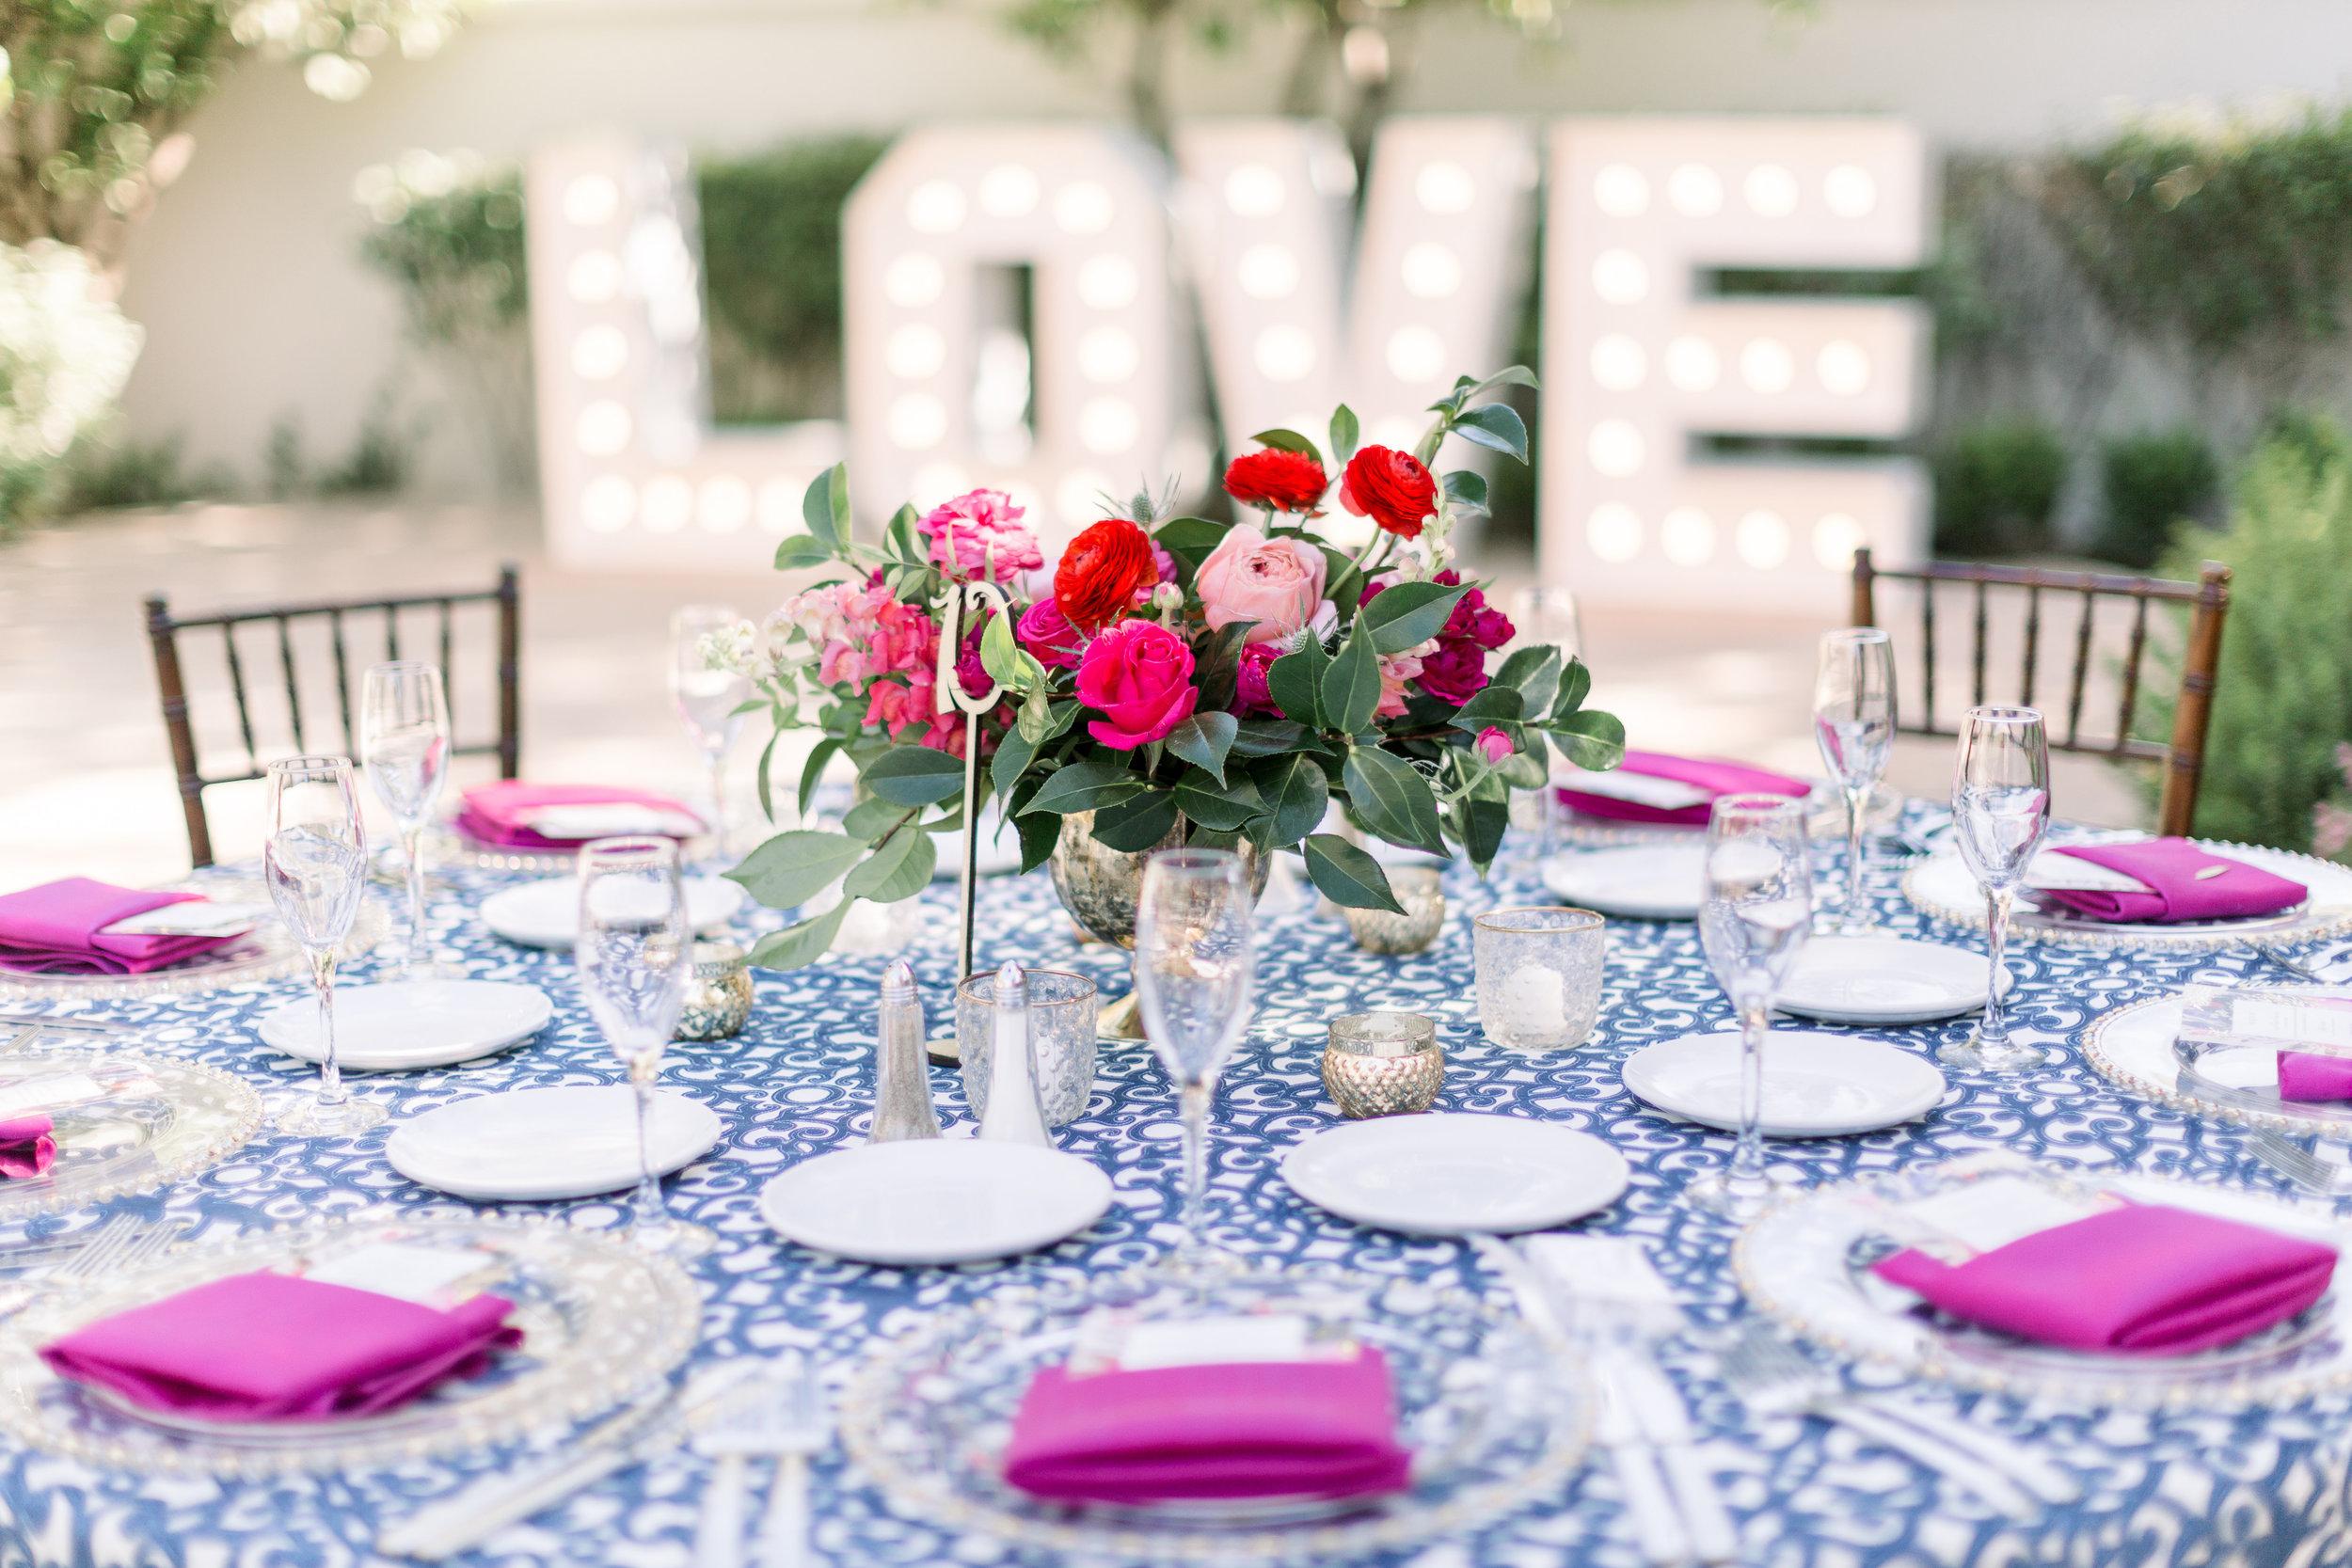 Roxanne and Brandon's El Chorro Wedding - Arizona florist Phoenix scottsdale Mesa chandler Sedona Prescott - La Tavola Linen Sutherland - Magenta, Blush, and Red Centerpieces